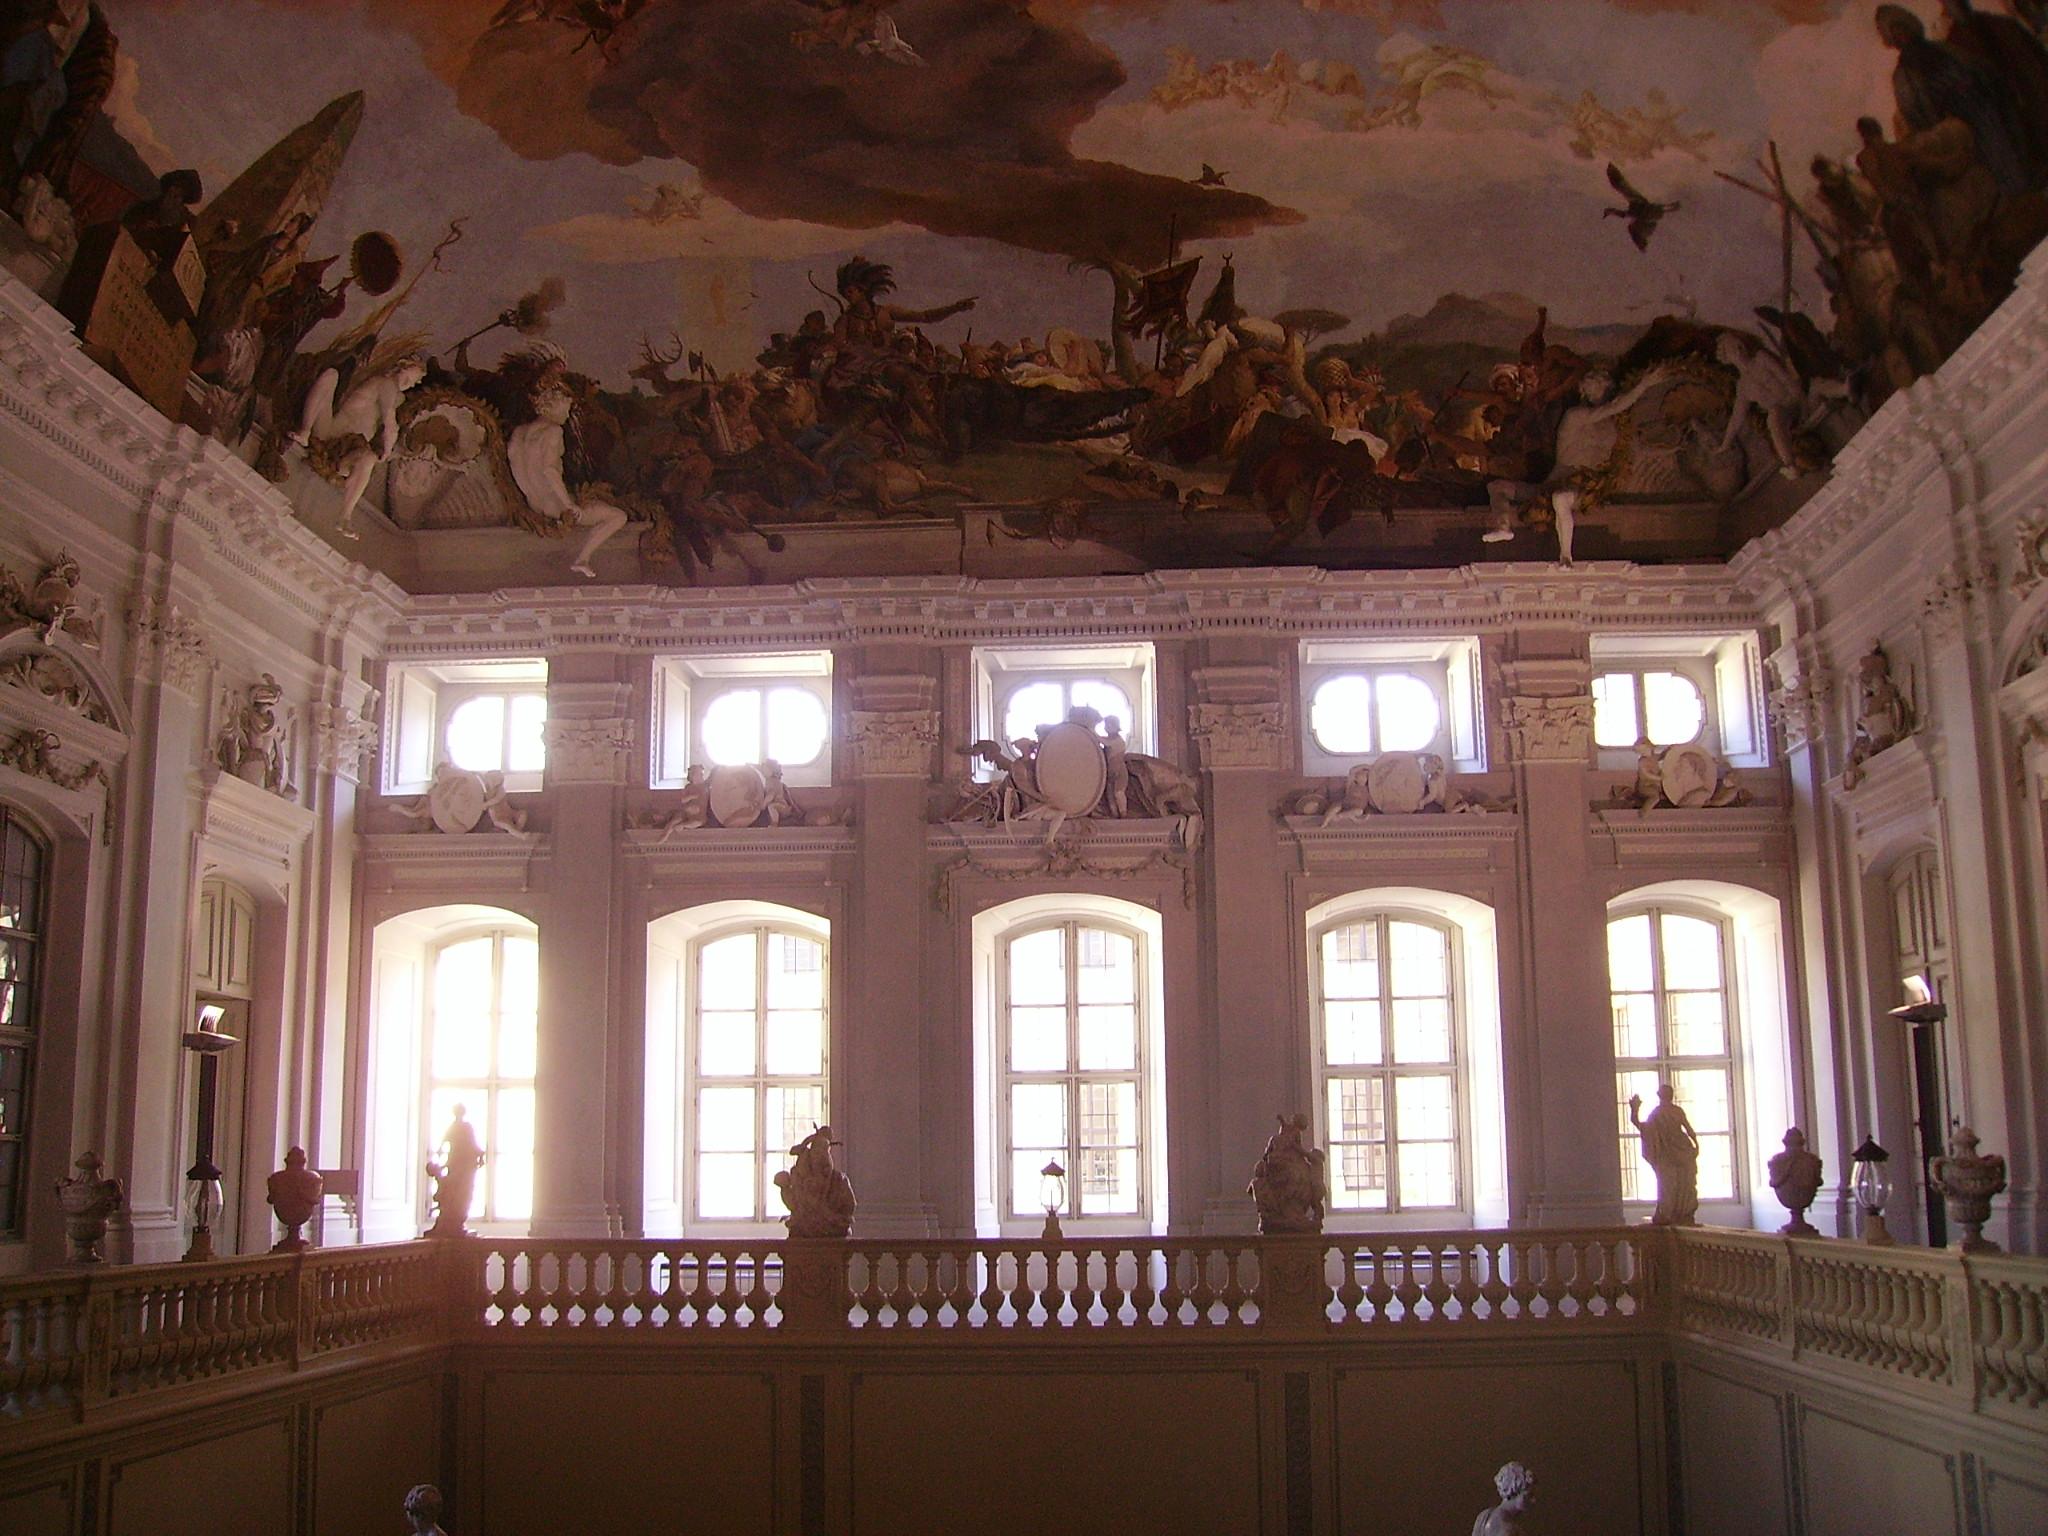 Gemütlich Residenz Innen Ideen - Images for inspirierende Ideen für ...